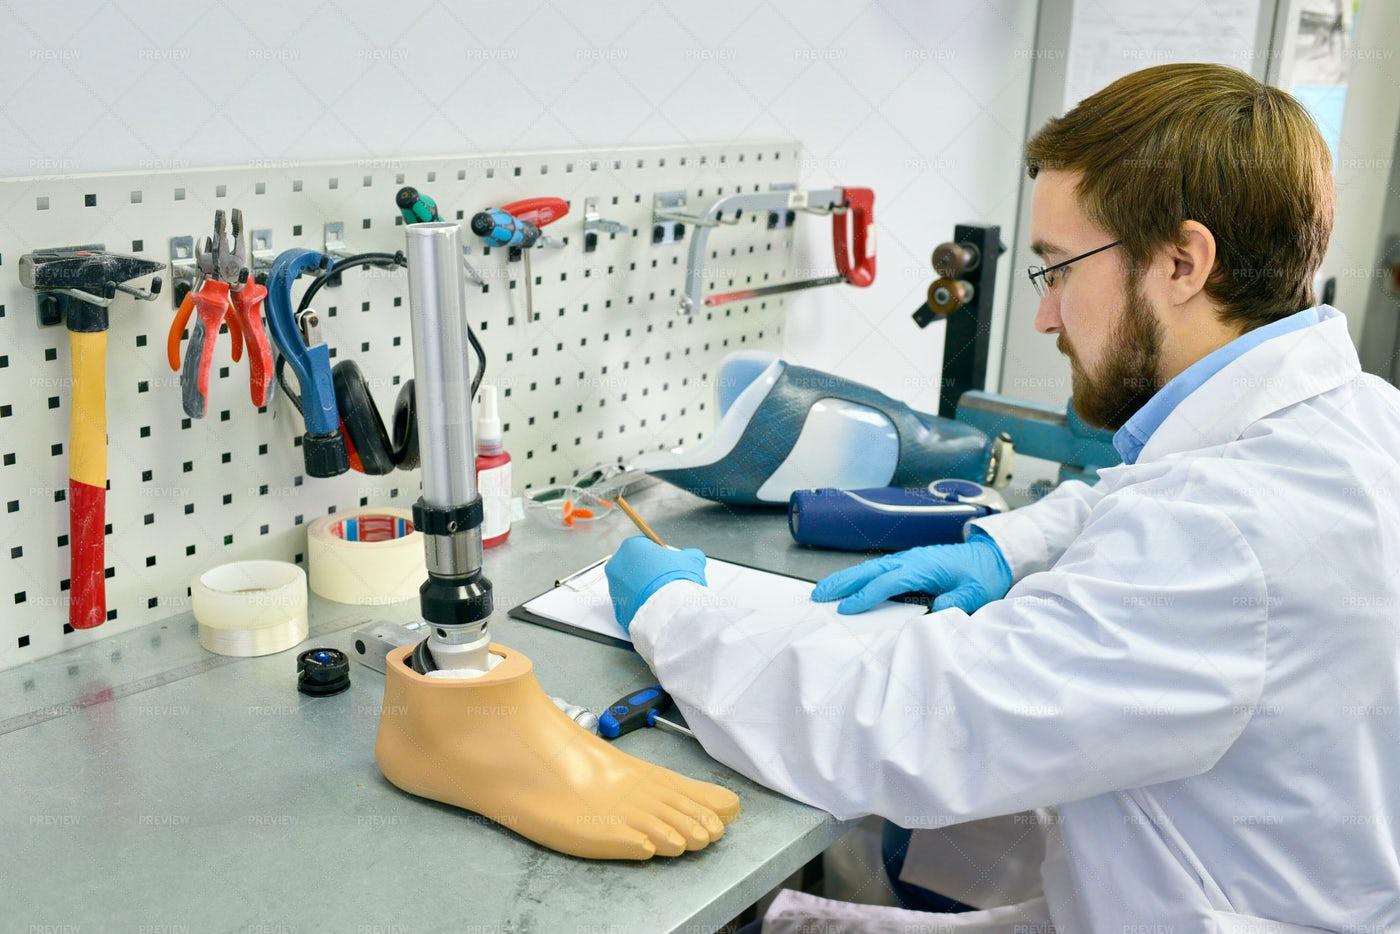 Prosthetist Working In Laboratory: Stock Photos